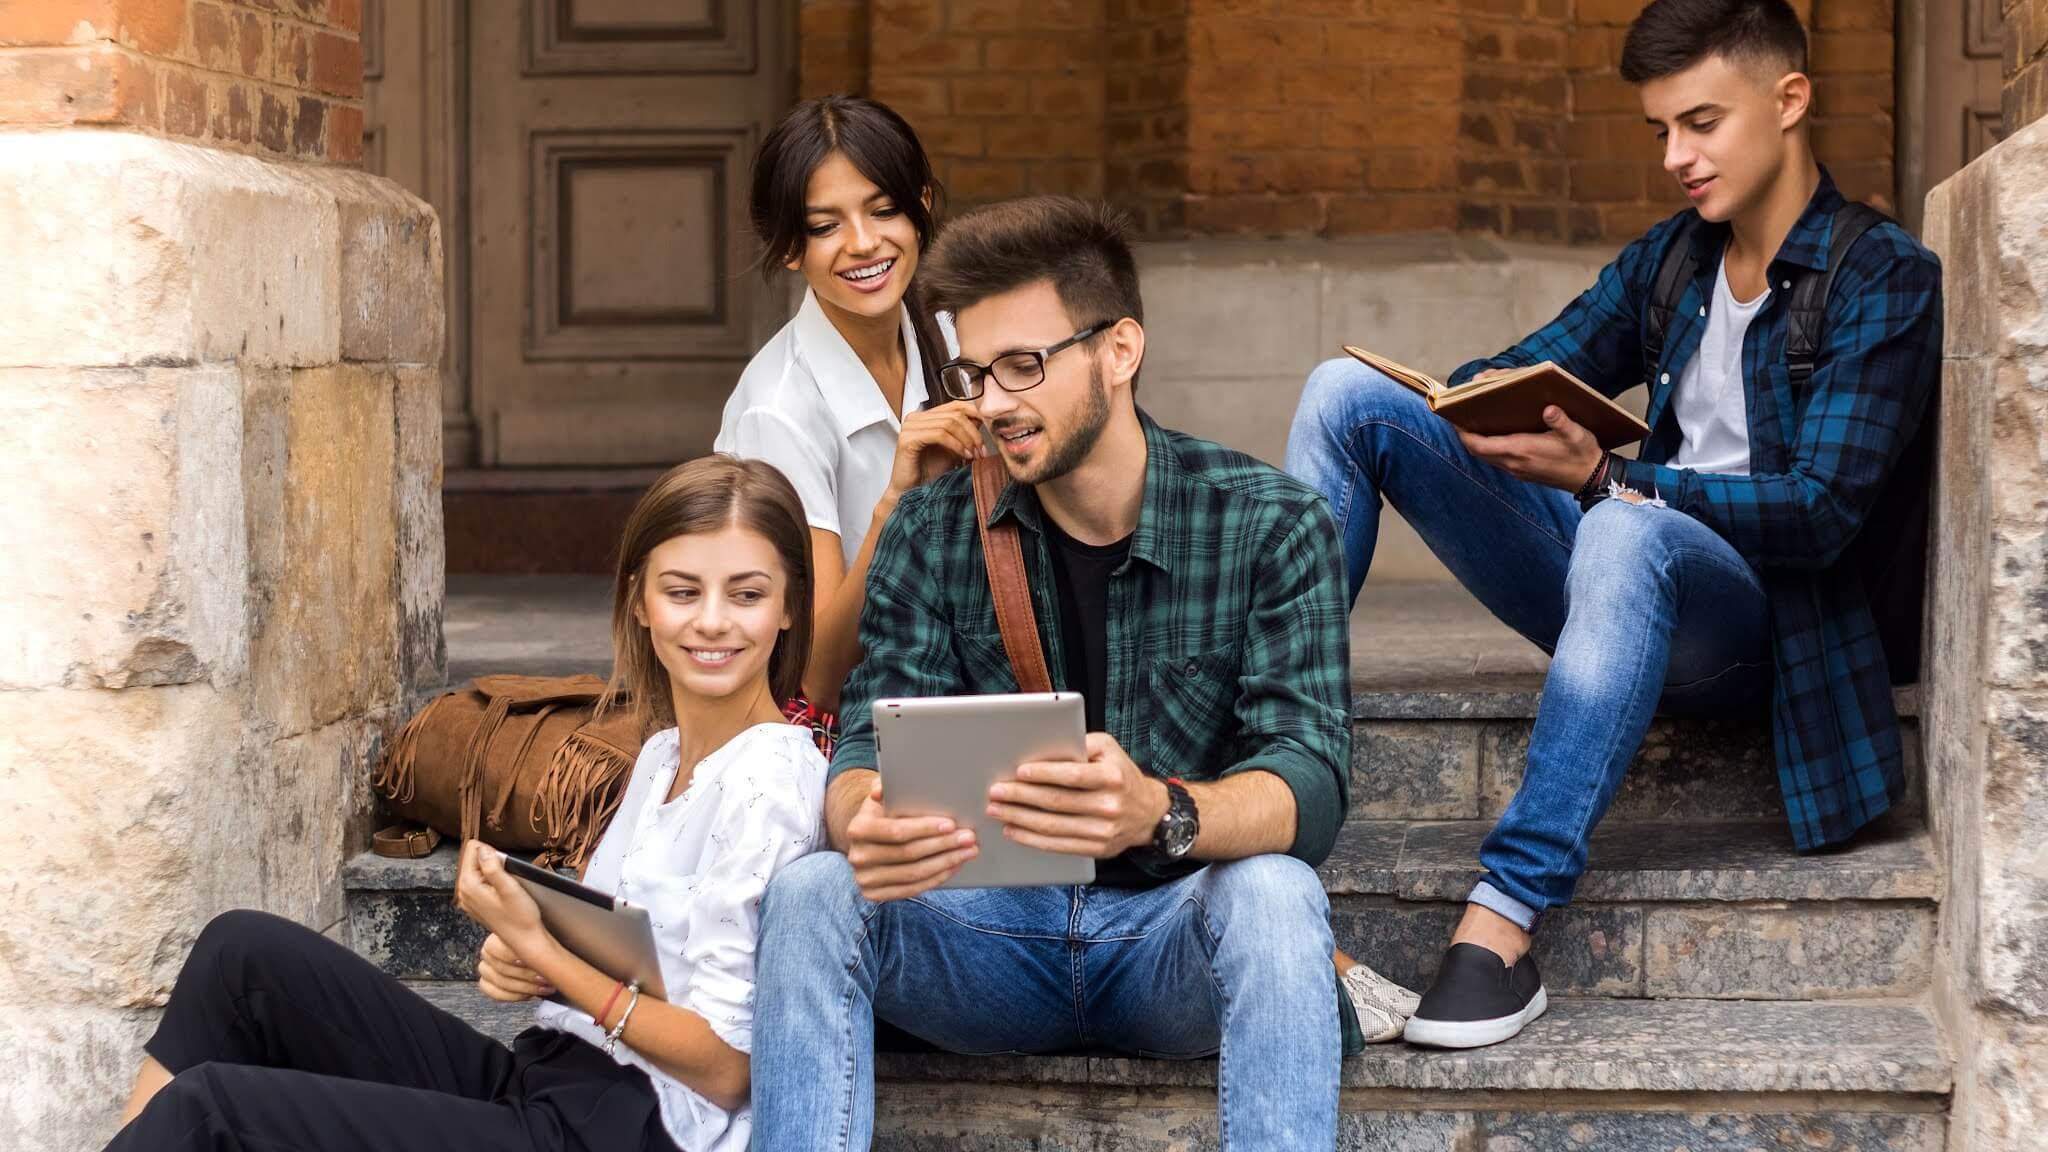 student life in thessaloniki